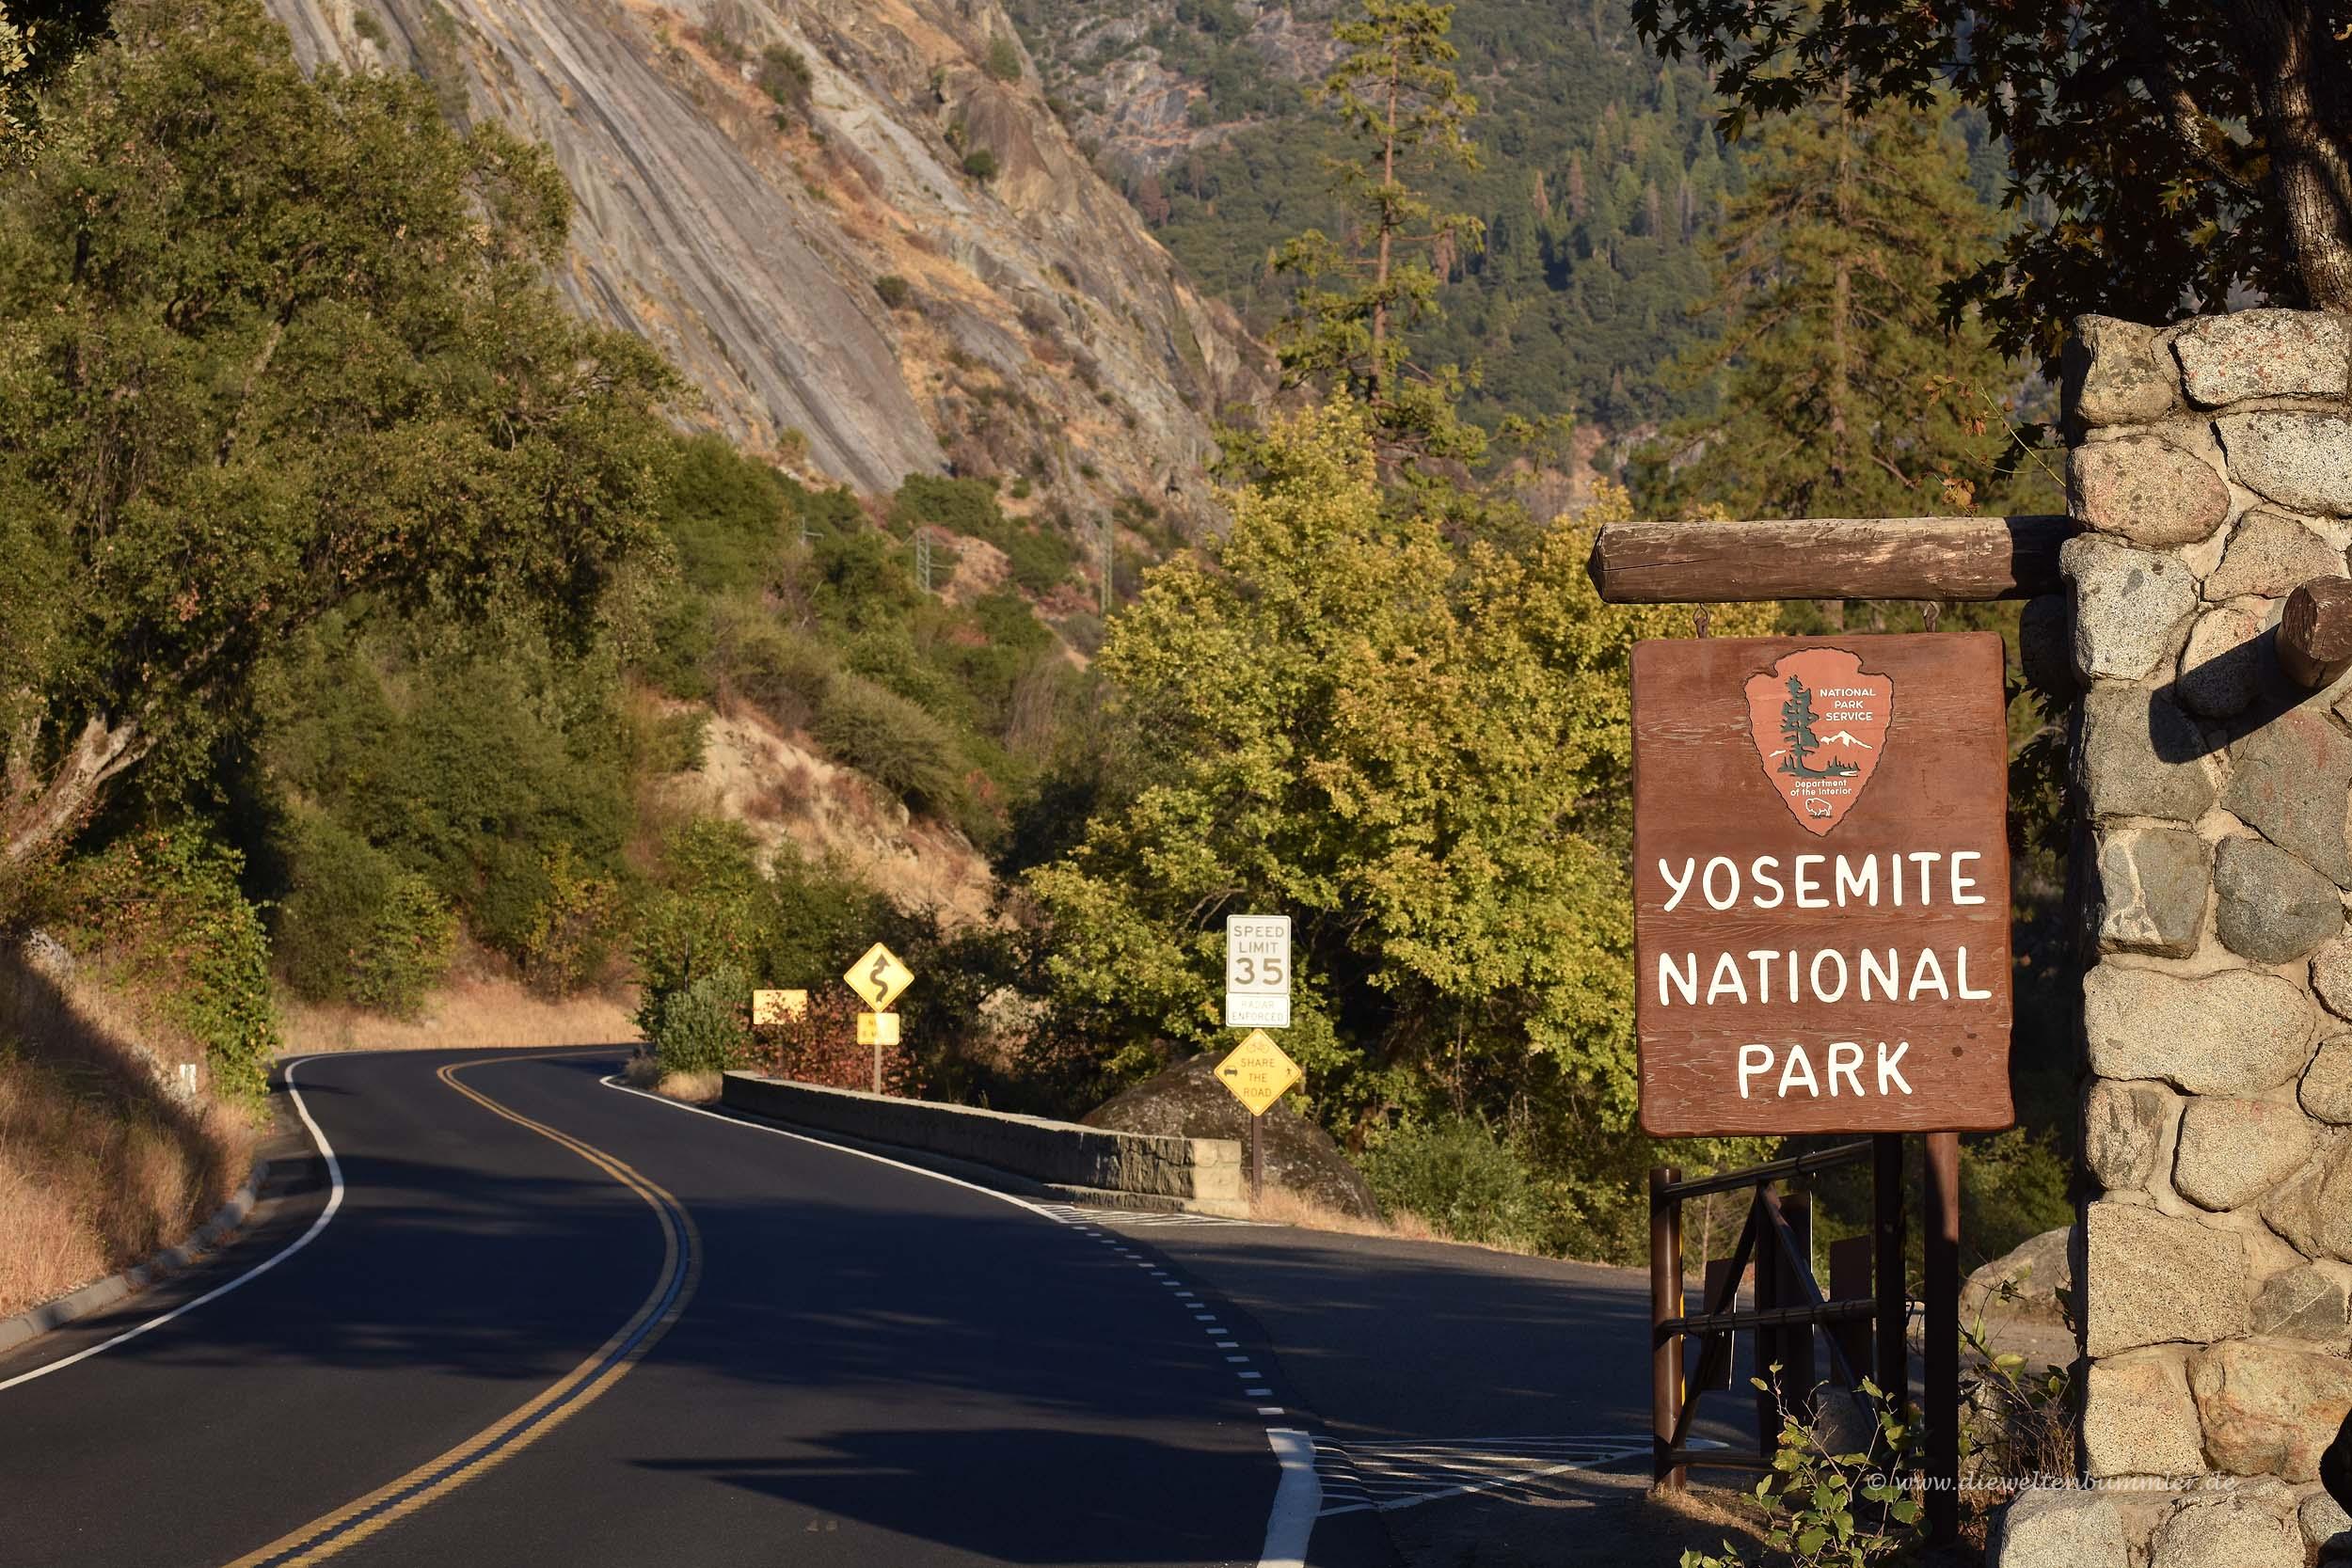 Zufahrt zum Yosemite-Nationalpark